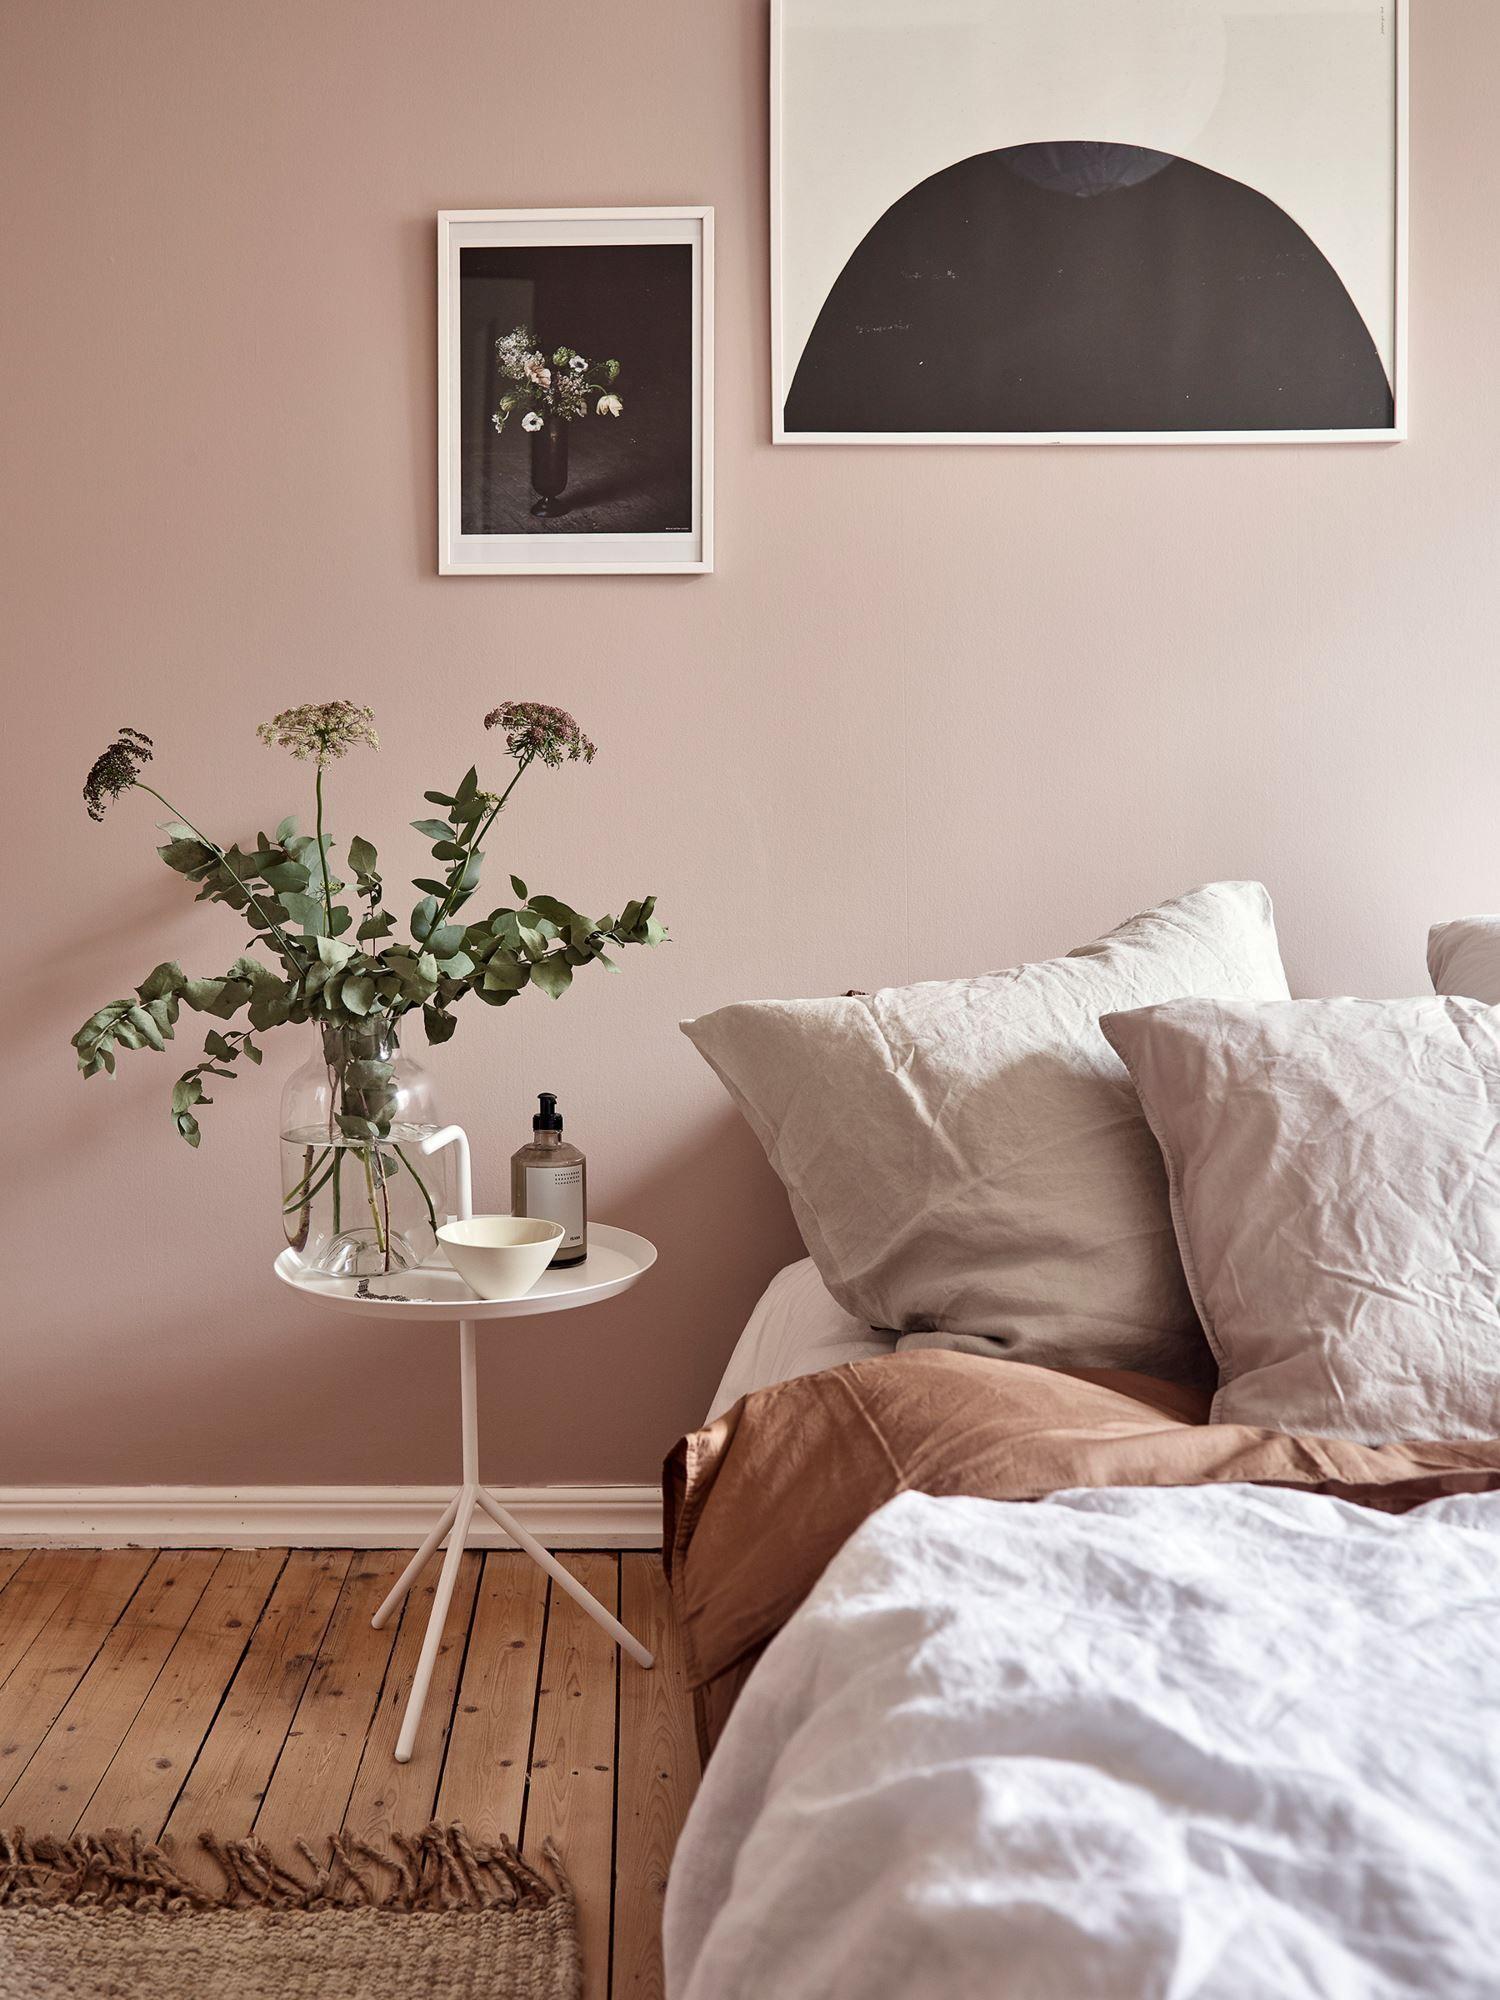 Dusty Pink Bedroom Walls Coco Lapine Design Dusty Pink Bedroom Pink Bedroom Walls Bedroom Wall Colors